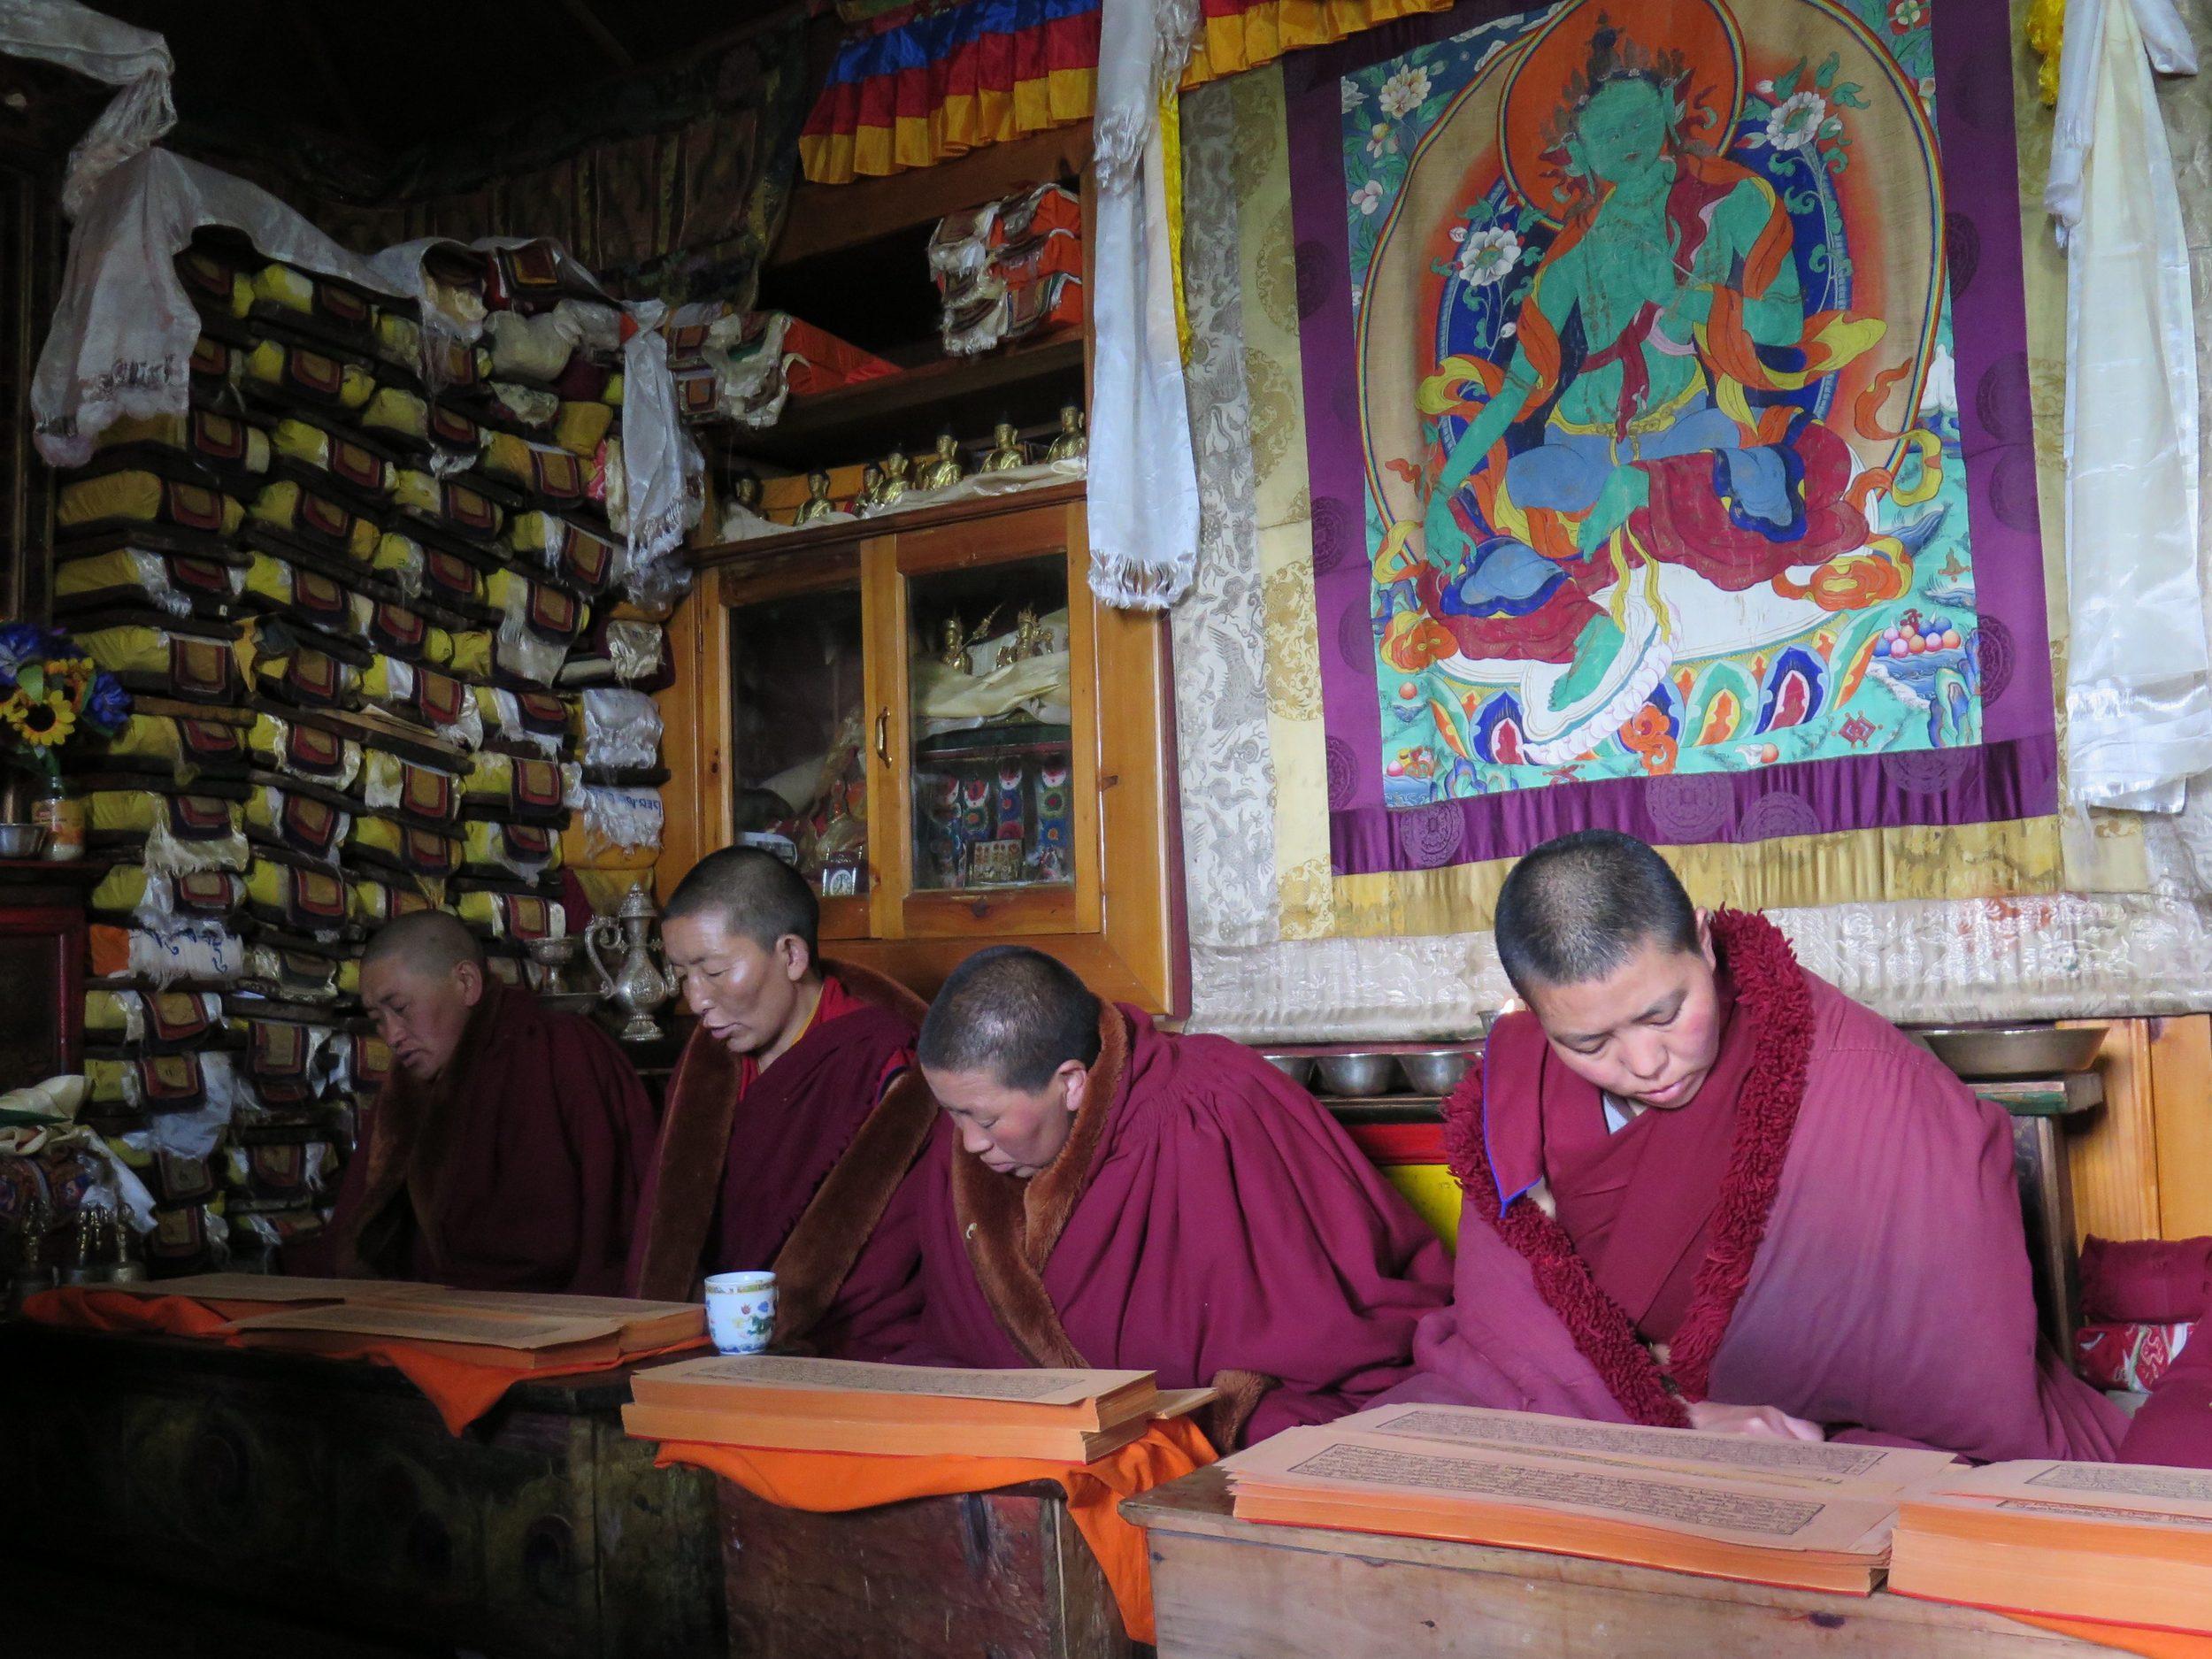 Rahibeler dua ederken / Nuns chanting